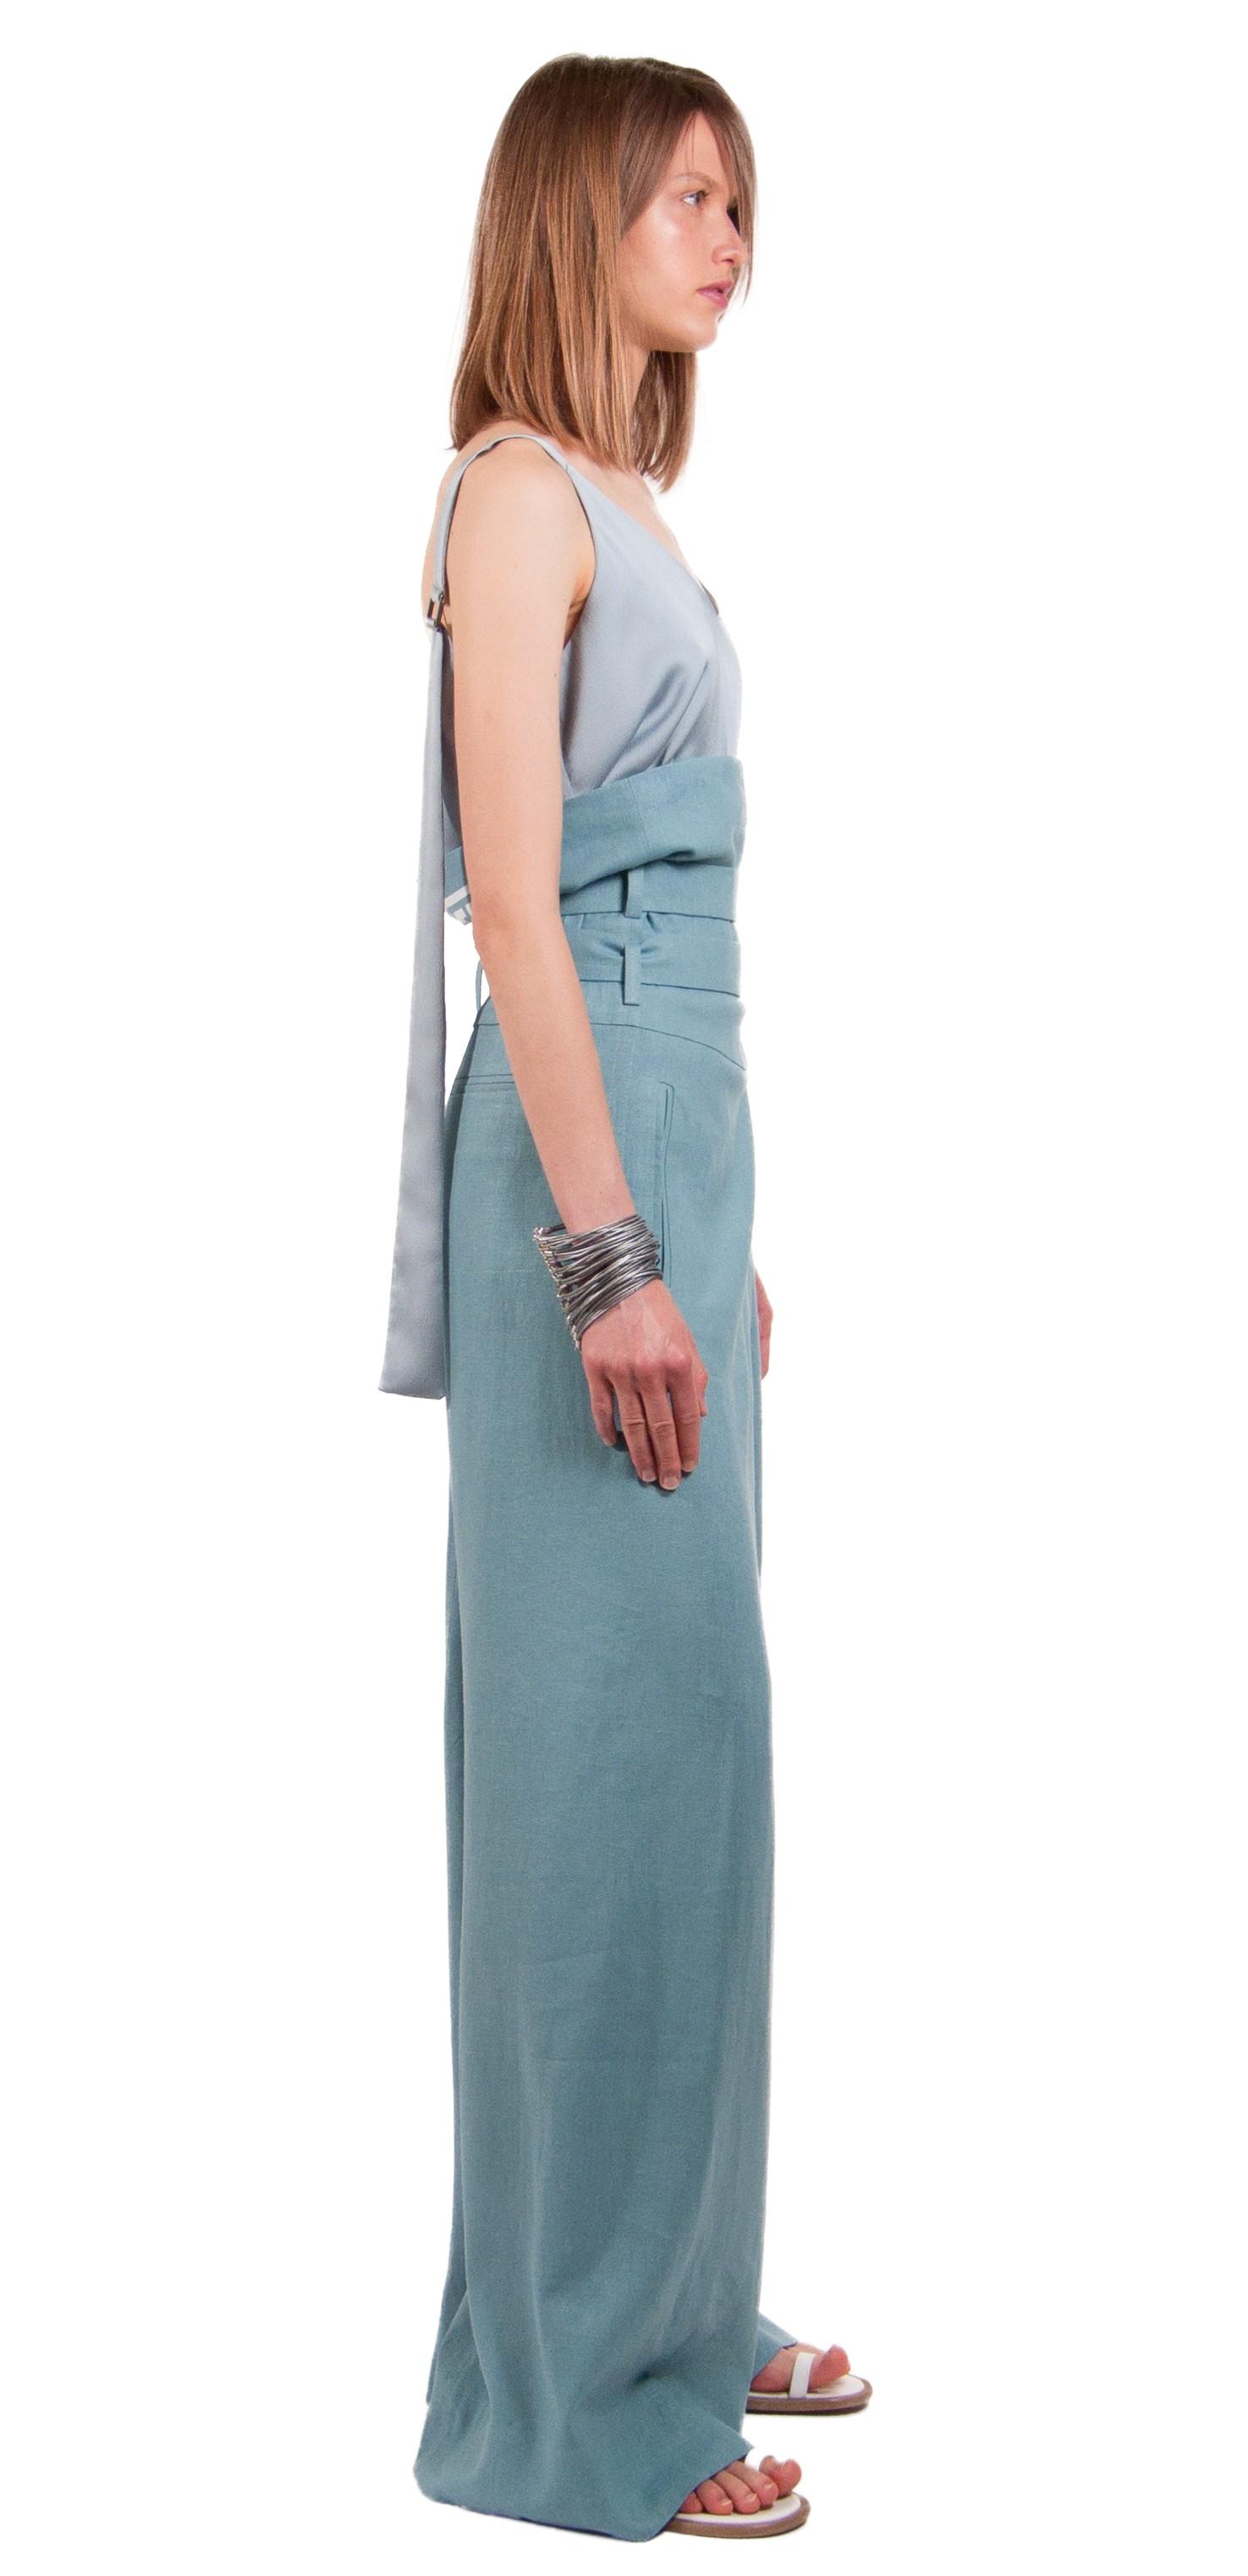 JSP THAI PANTS LONG